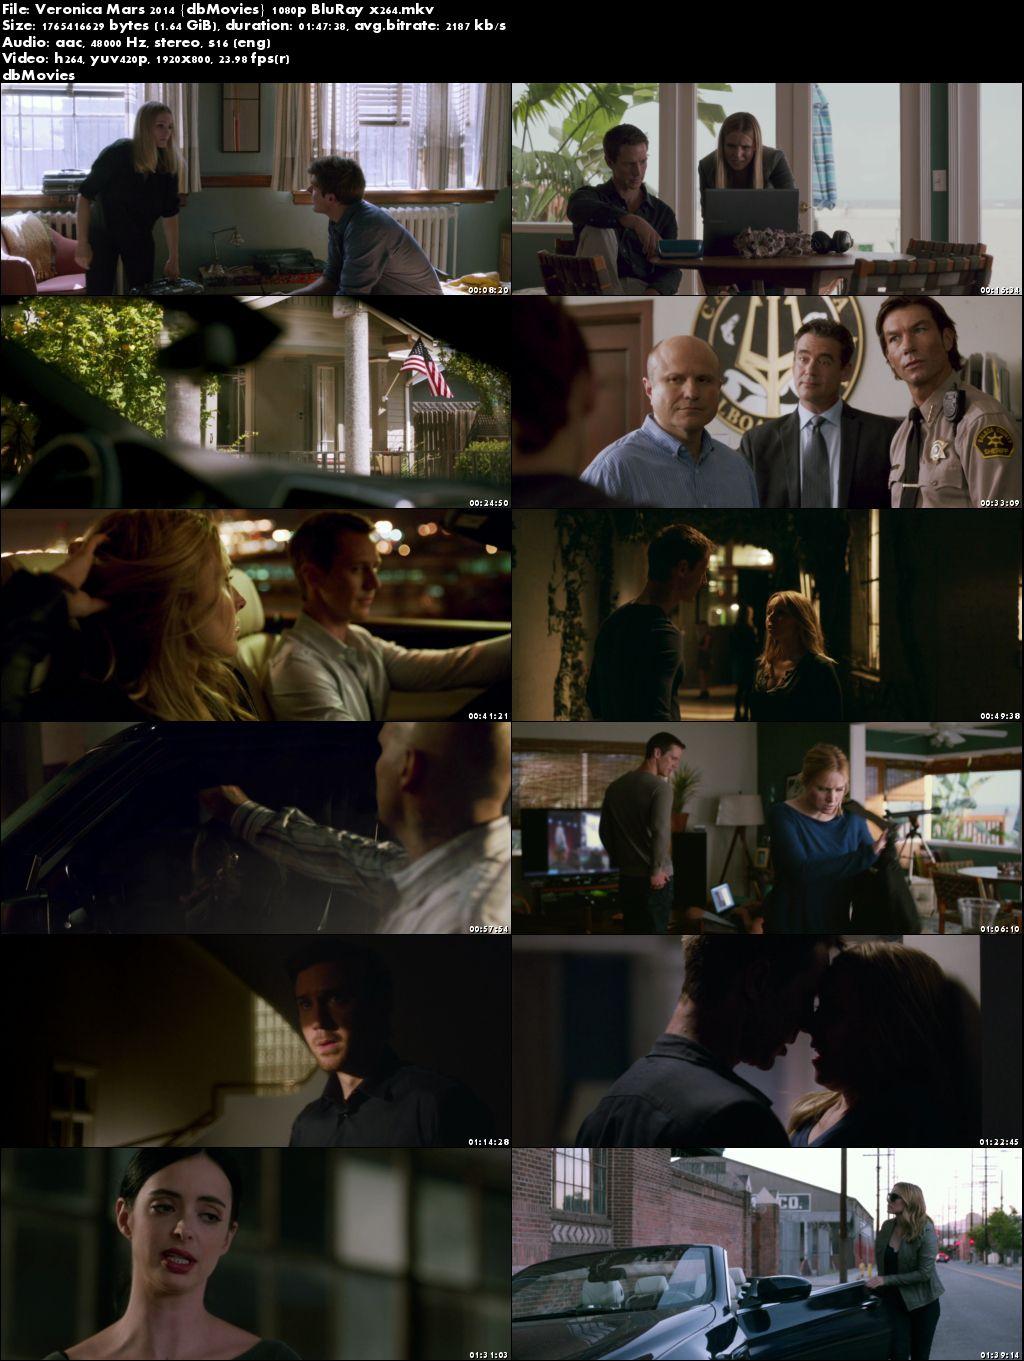 Screen Shots Veronica Mars 2014 Full HD Movie Download Blu-Ray 1080p